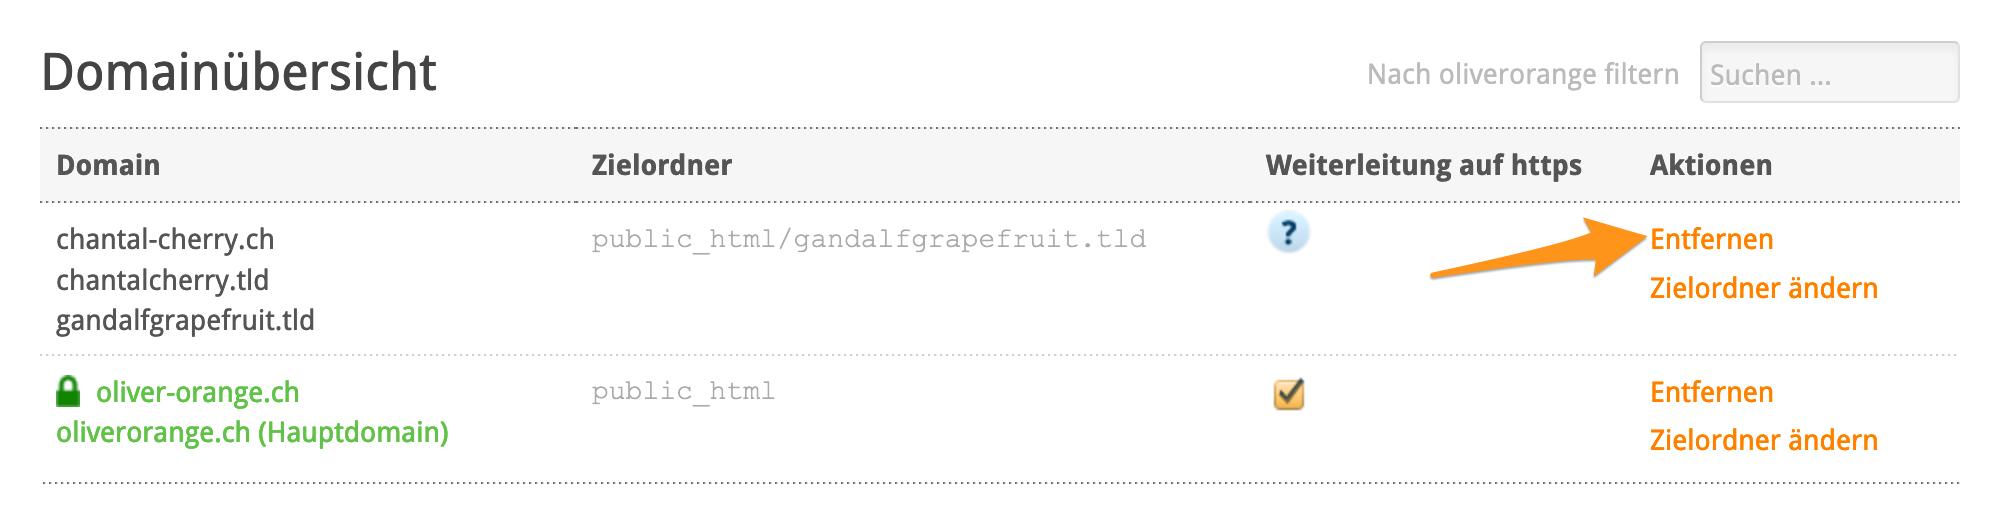 Domainübersicht